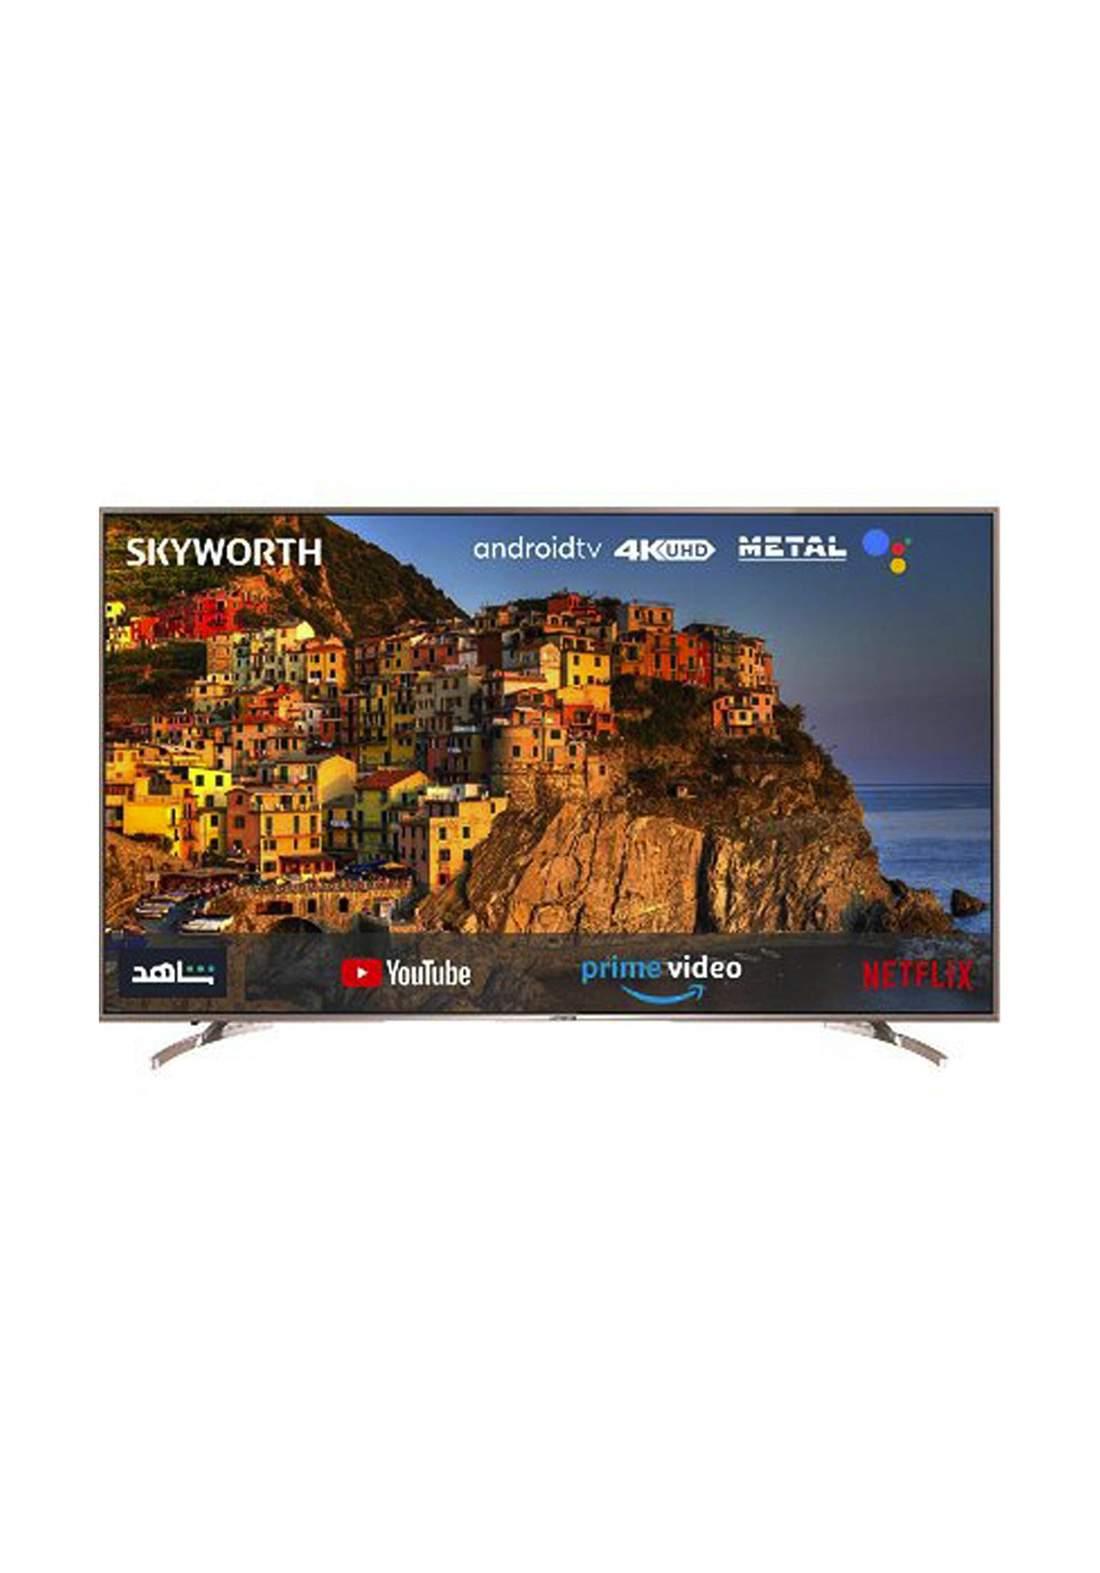 "Skyworth 75SUC8100 LED 75 "" smart Android Smart TV with DVBT2 - Black  شاشة"